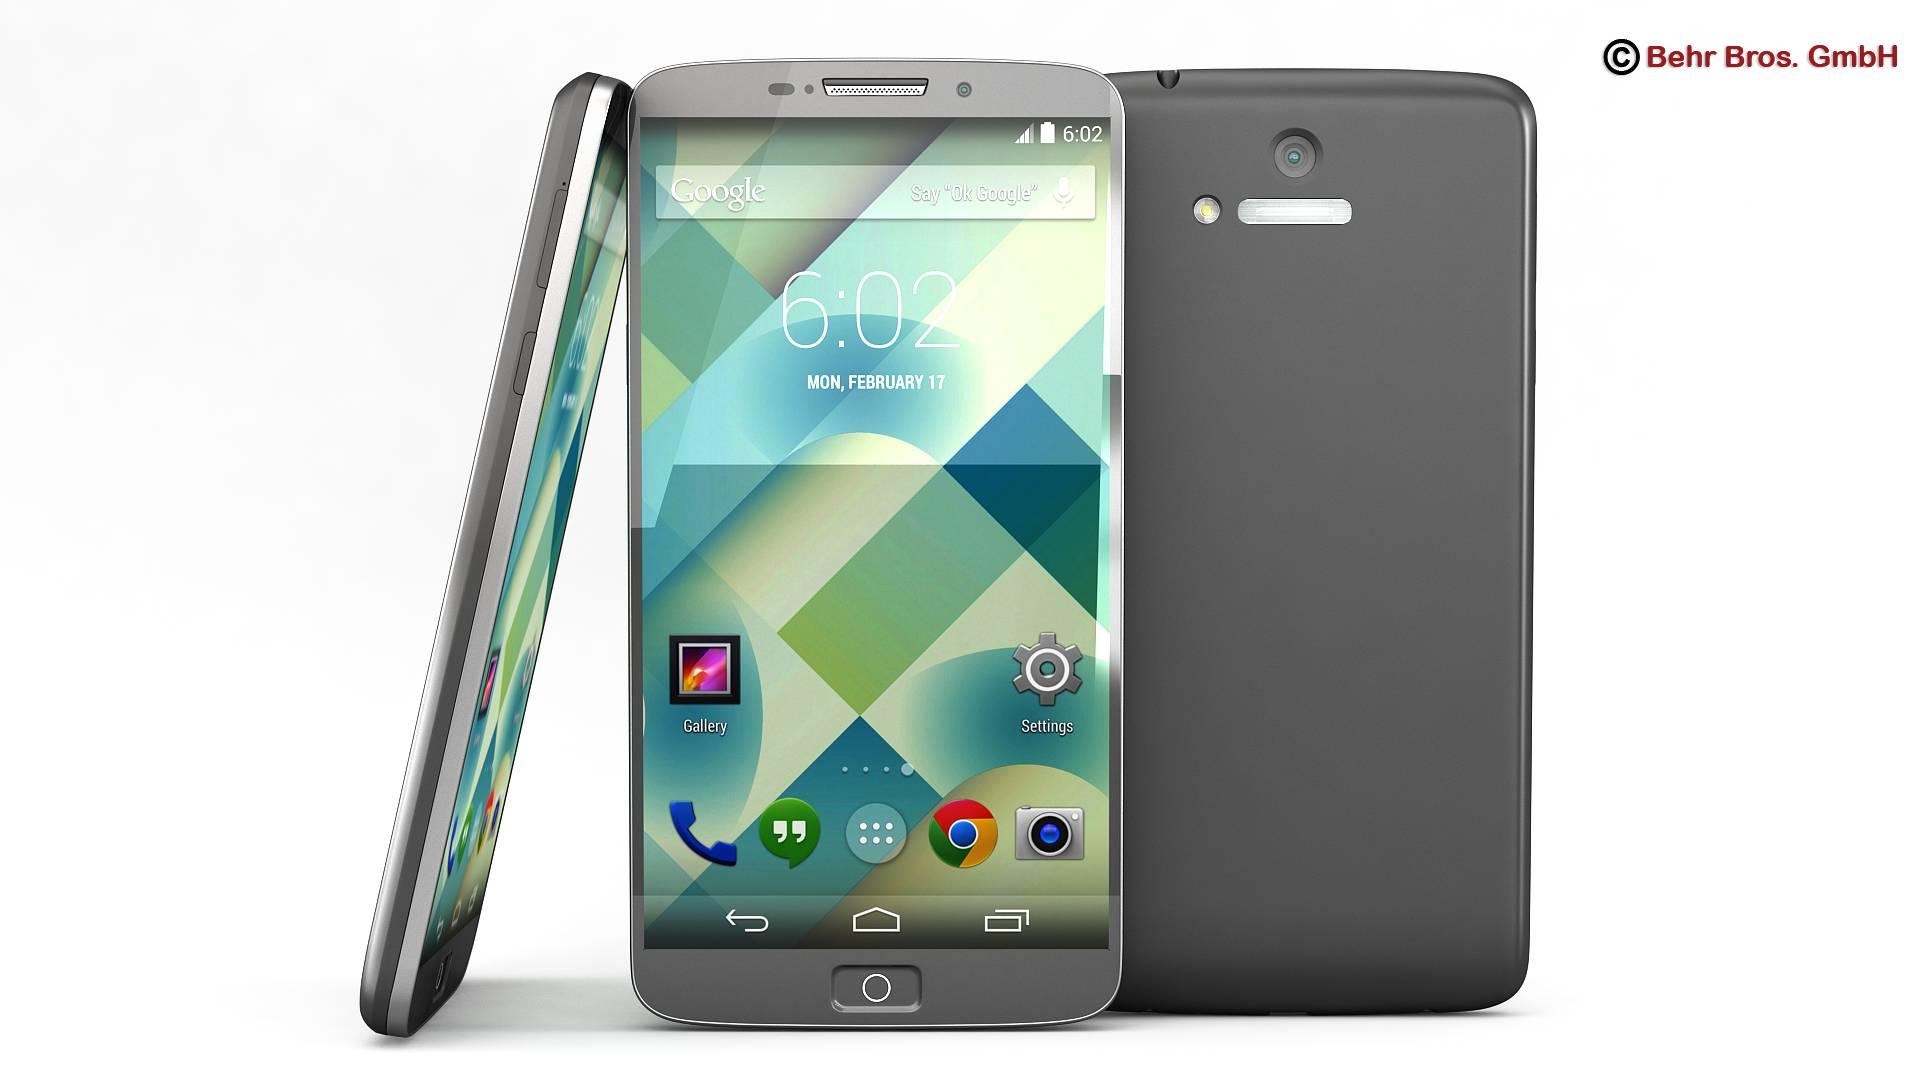 generic smartphone 6 inch 3d model 3ds max fbx c4d lwo ma mb obj 161658